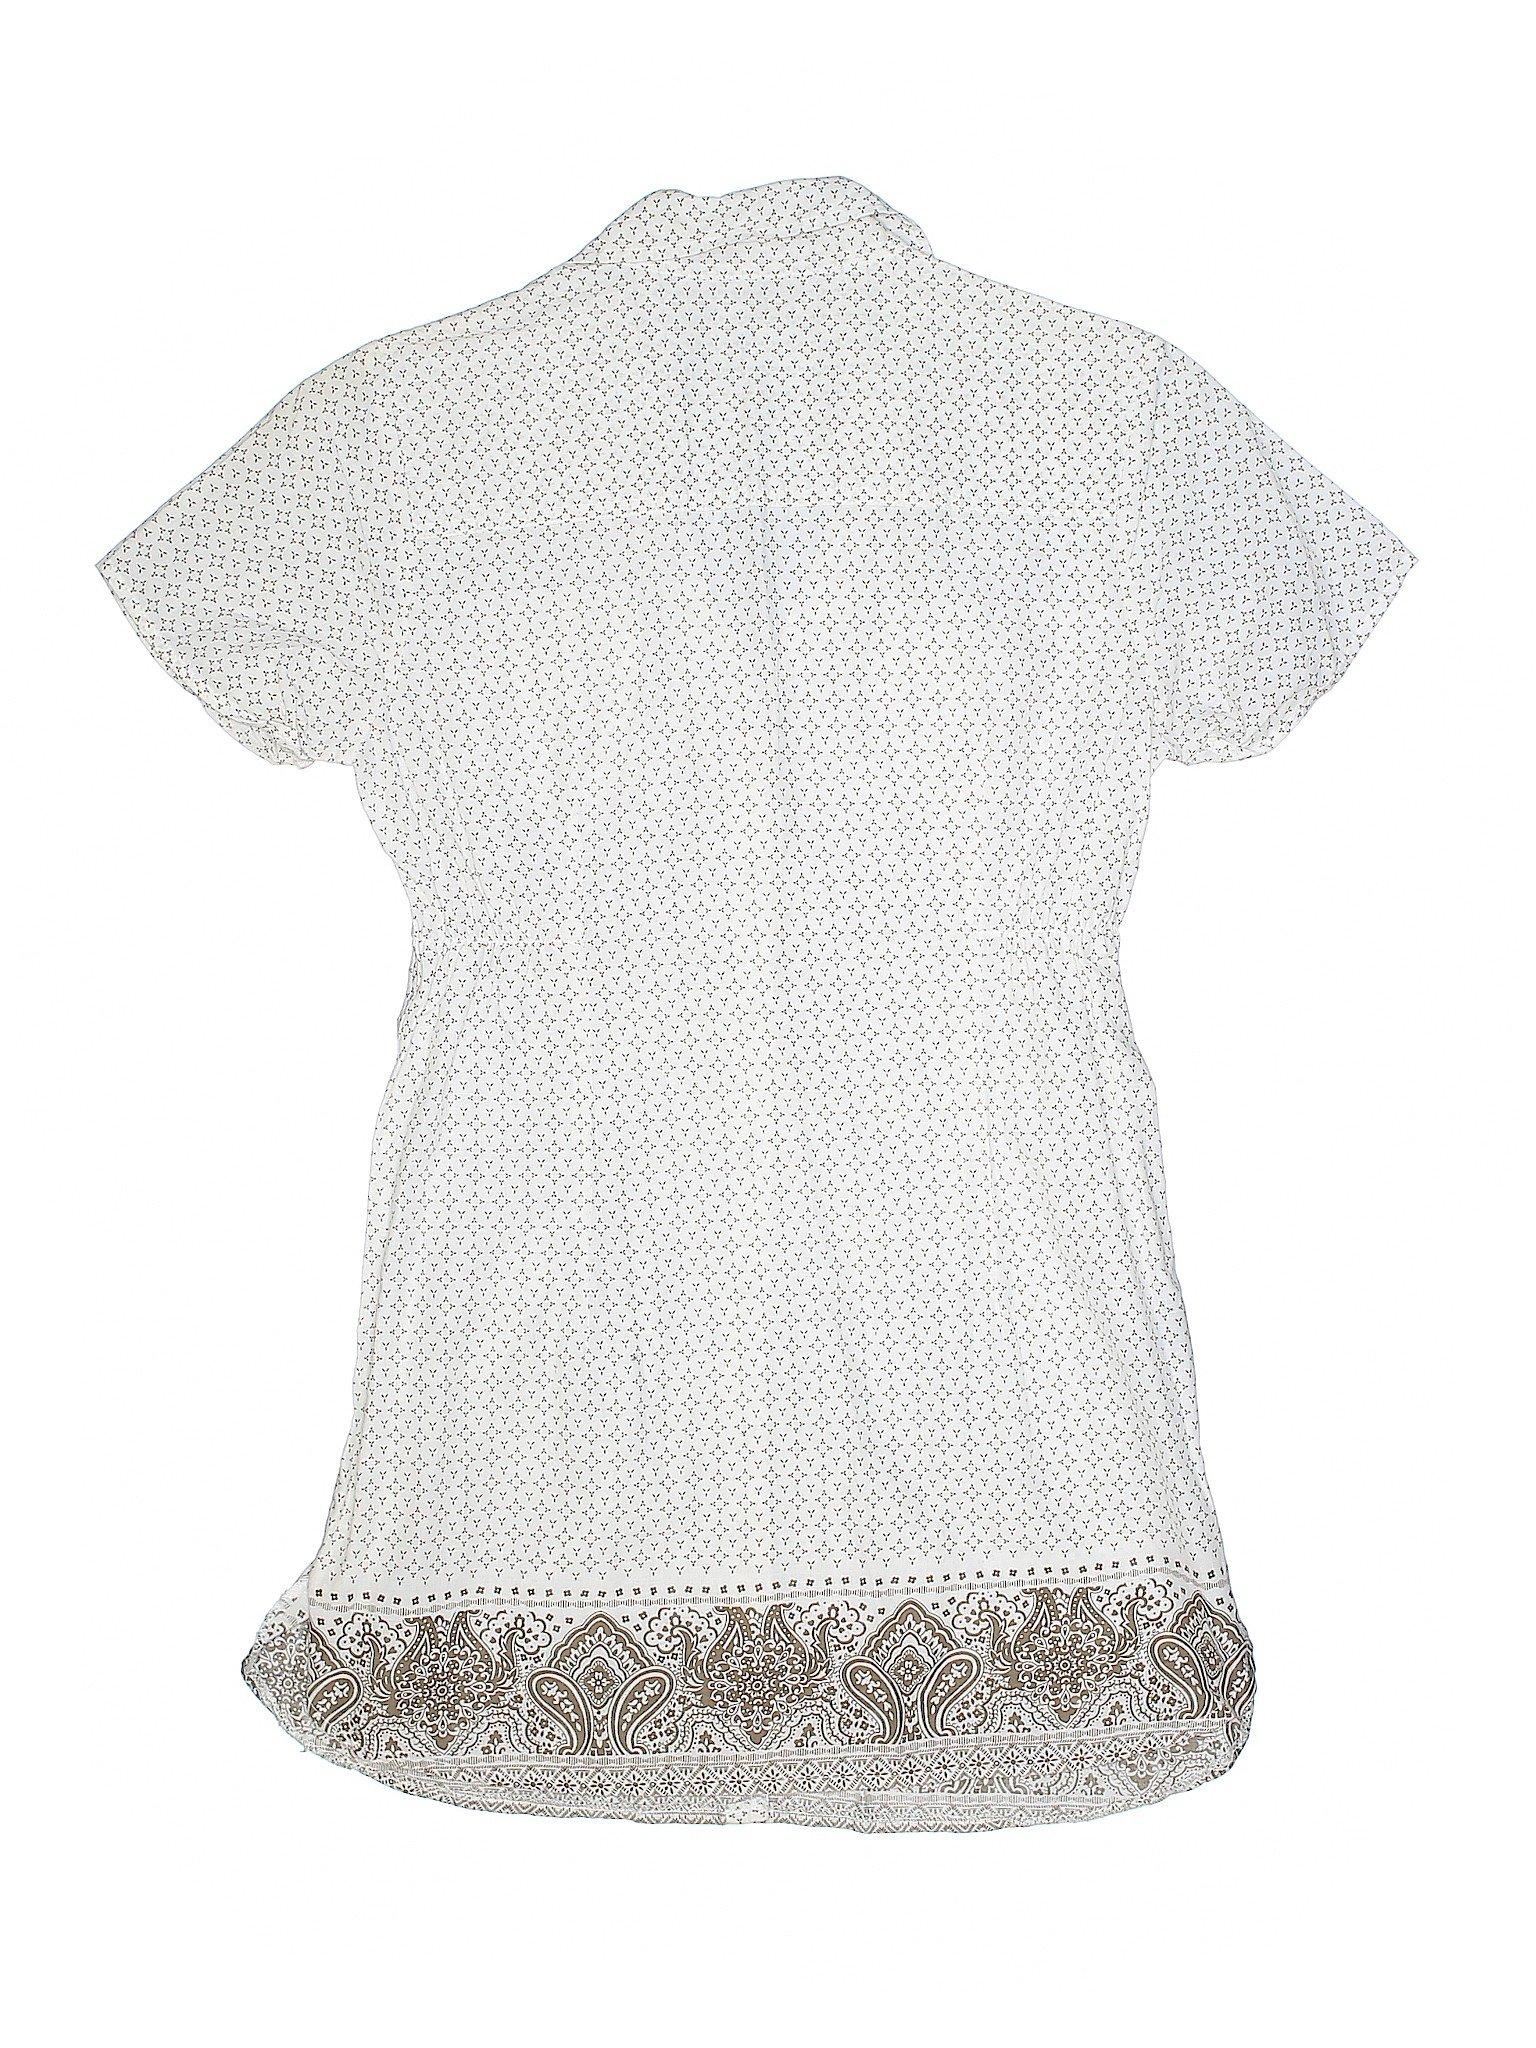 Tee Paper Casual Dress winter Boutique wYUSqBZ